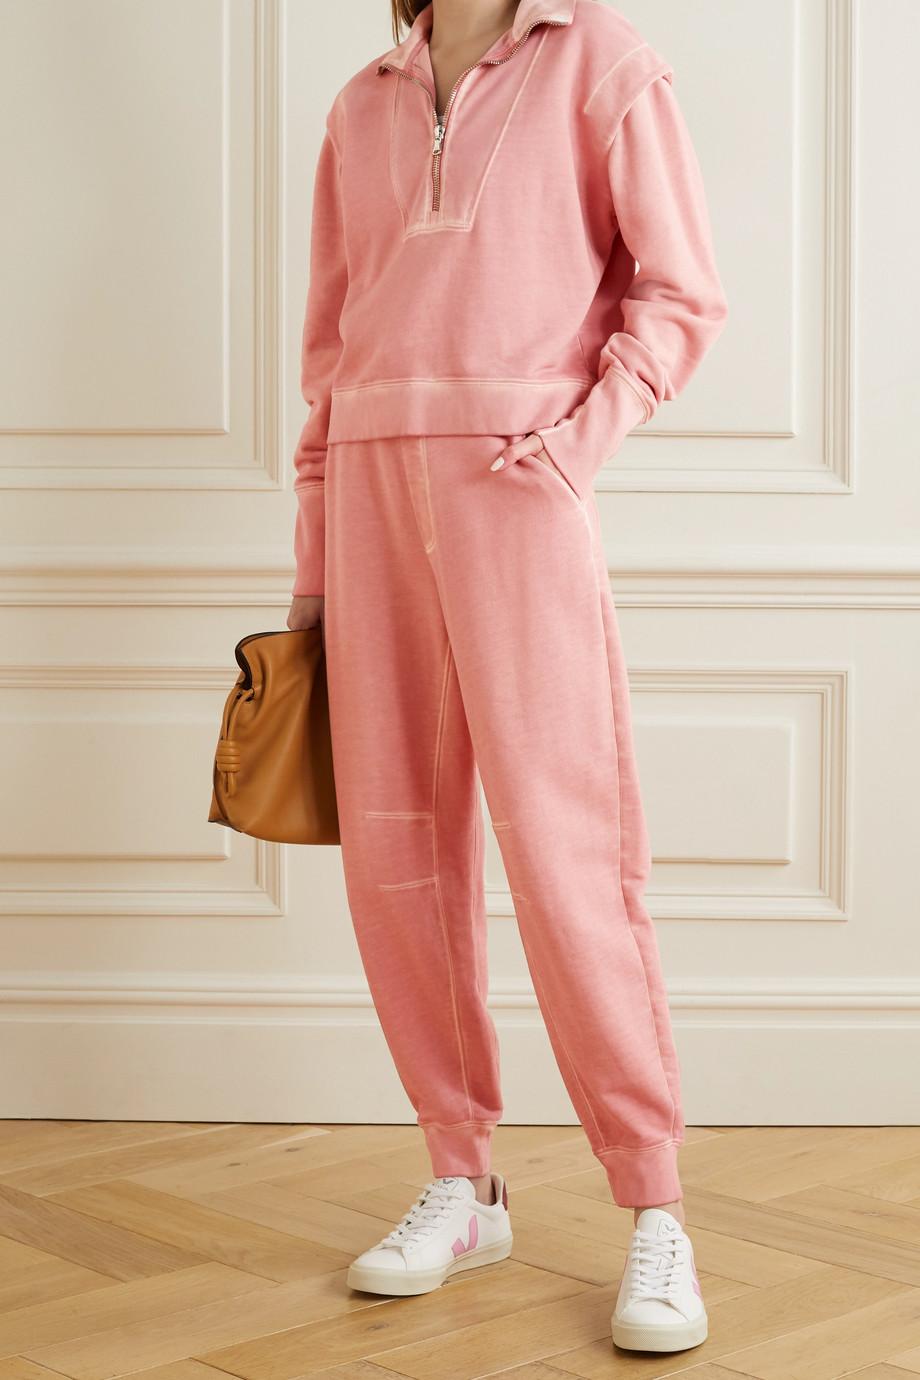 Veronica Beard Pantalon de survêtement en molleton de coton Preslee